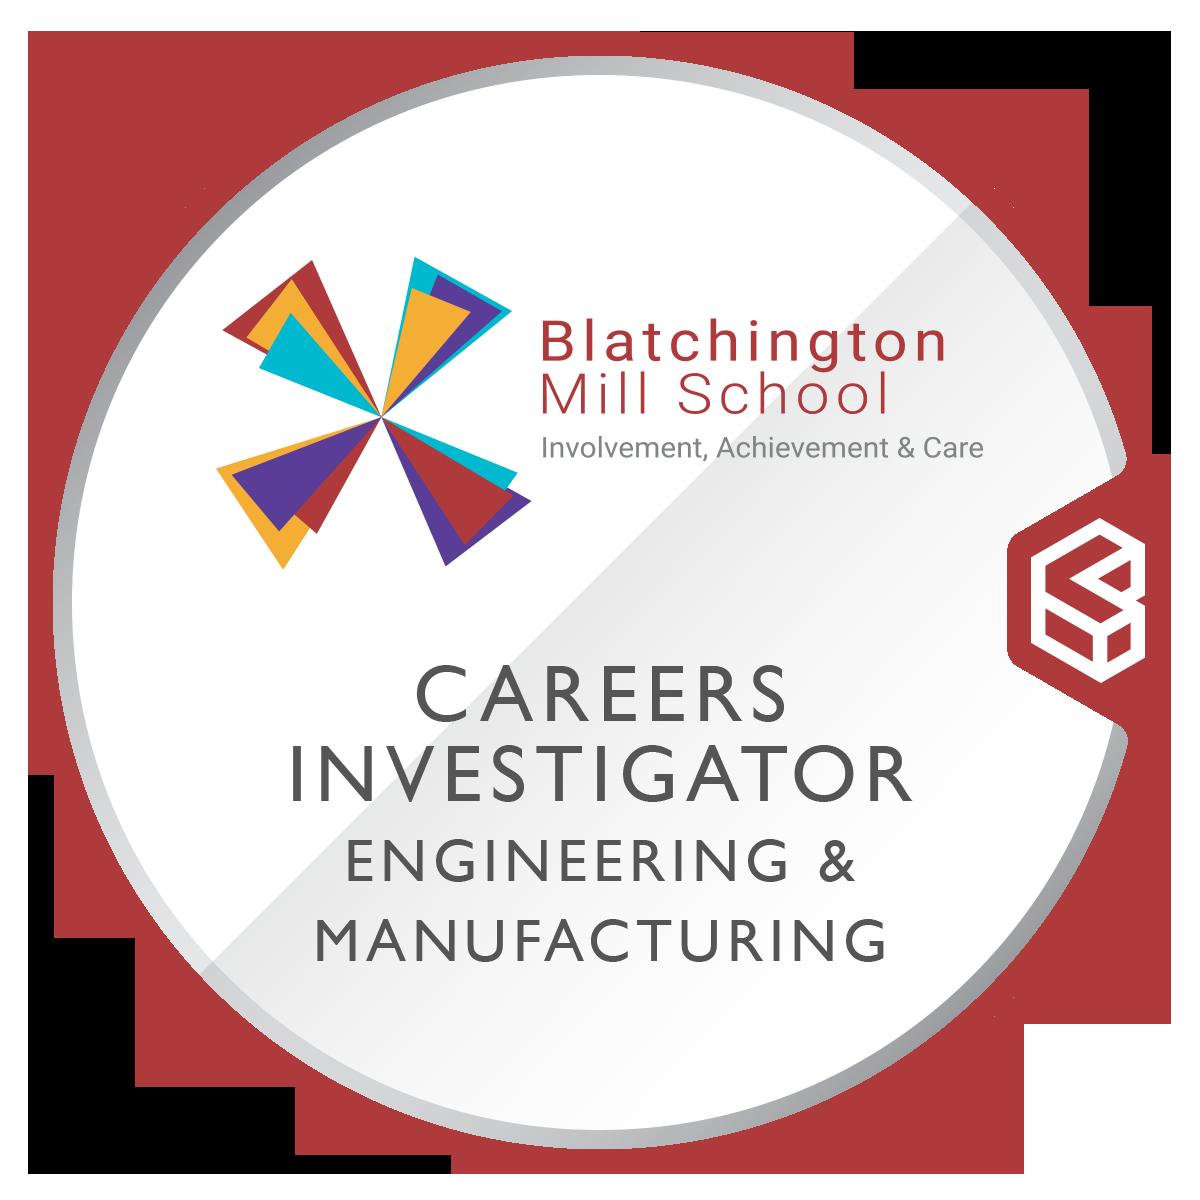 Blatchington Mill School Careers Investigator Engineering & Manufacturing